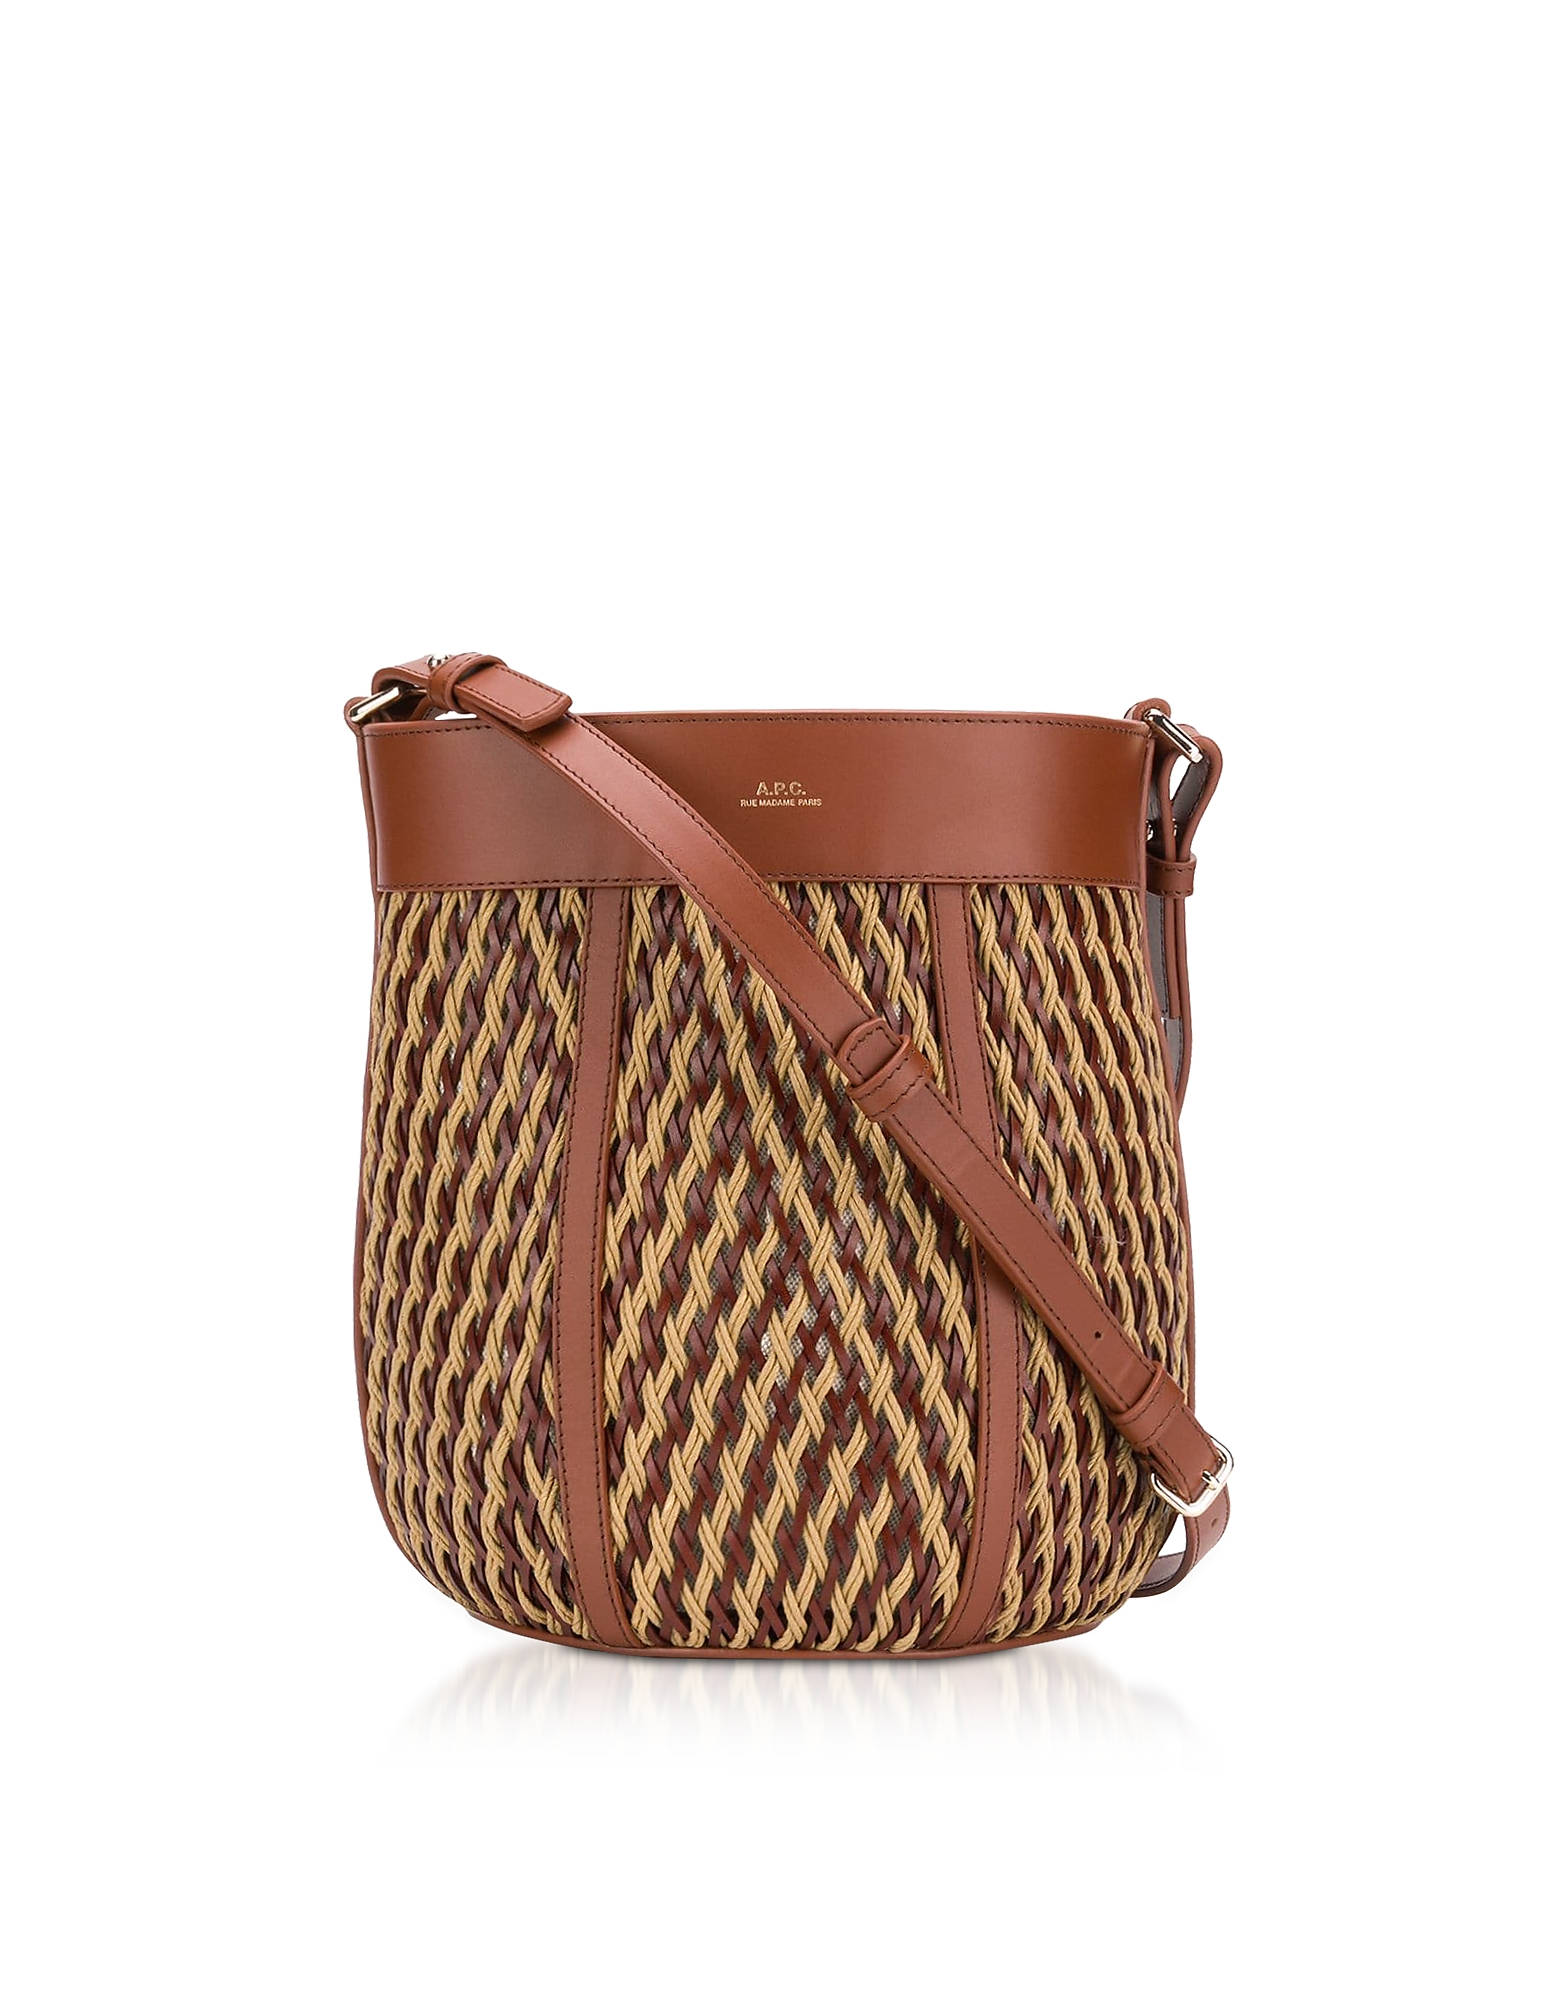 A.P.C. Designer Handbags, Garance Woven Leather Shoulder Bag